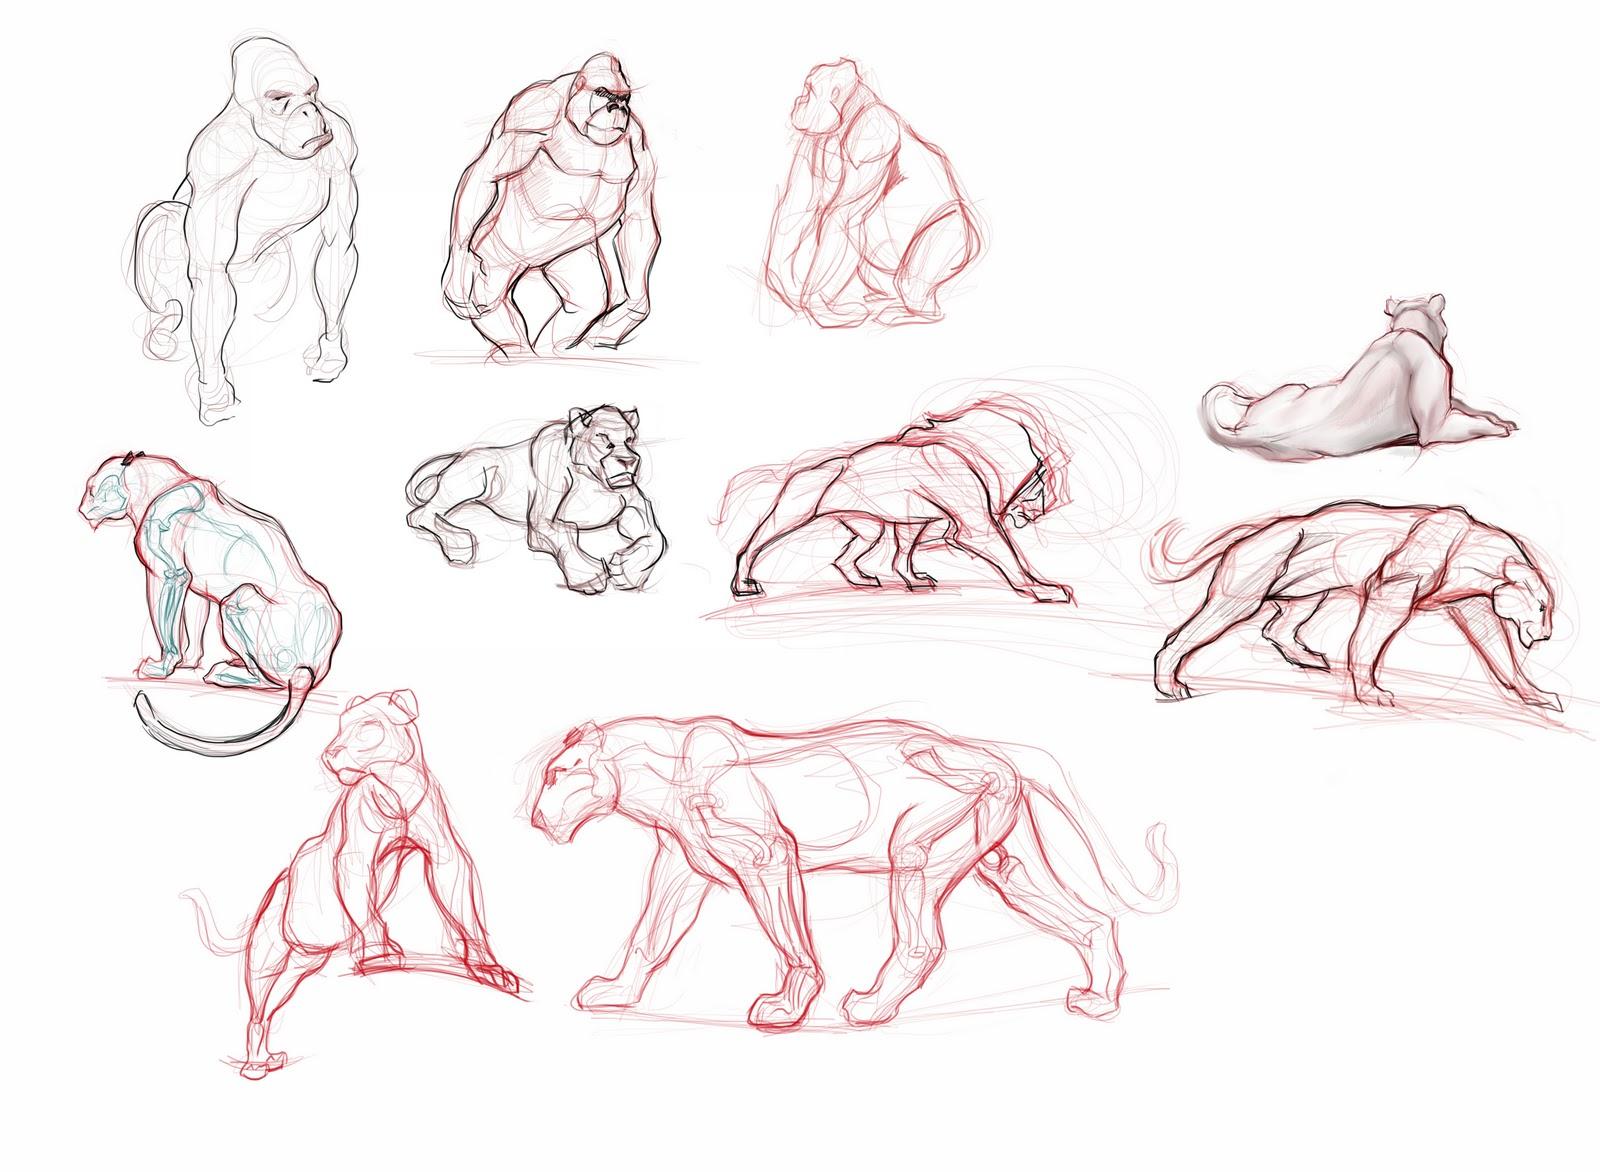 Lujo Dibujo Anatomía Animal Viñeta - Anatomía de Las Imágenesdel ...